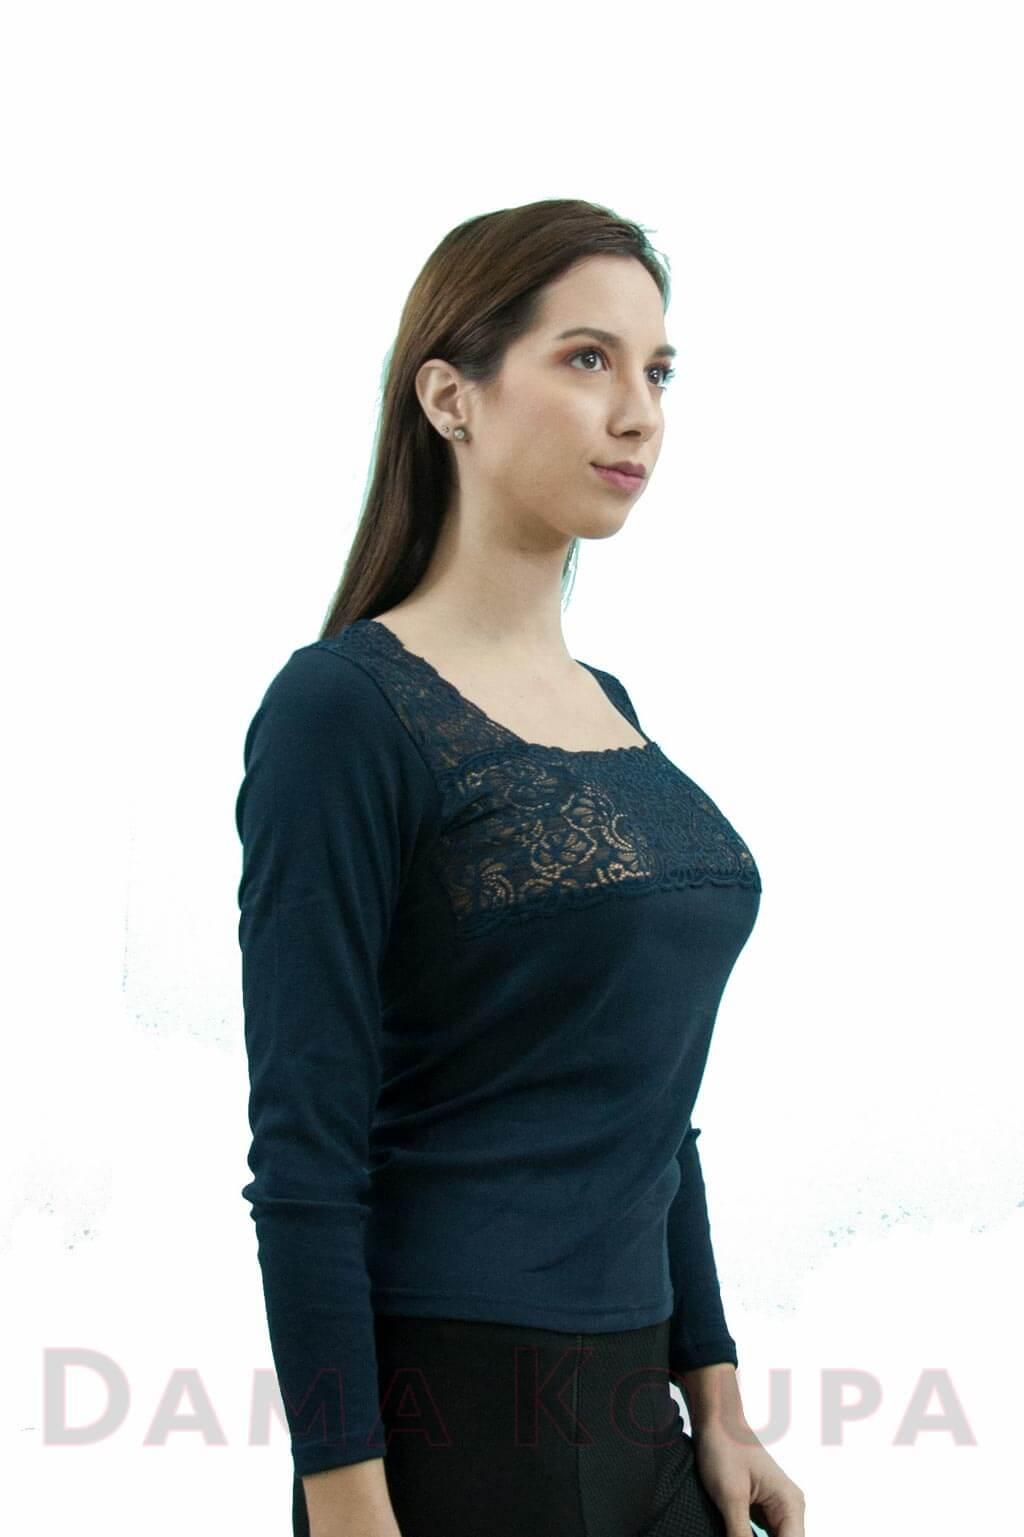 bfdc919406ba Μπλε μπλούζα με δαντέλα Γυναικείο φανελάκι με δαντέλα στο στήθος ...